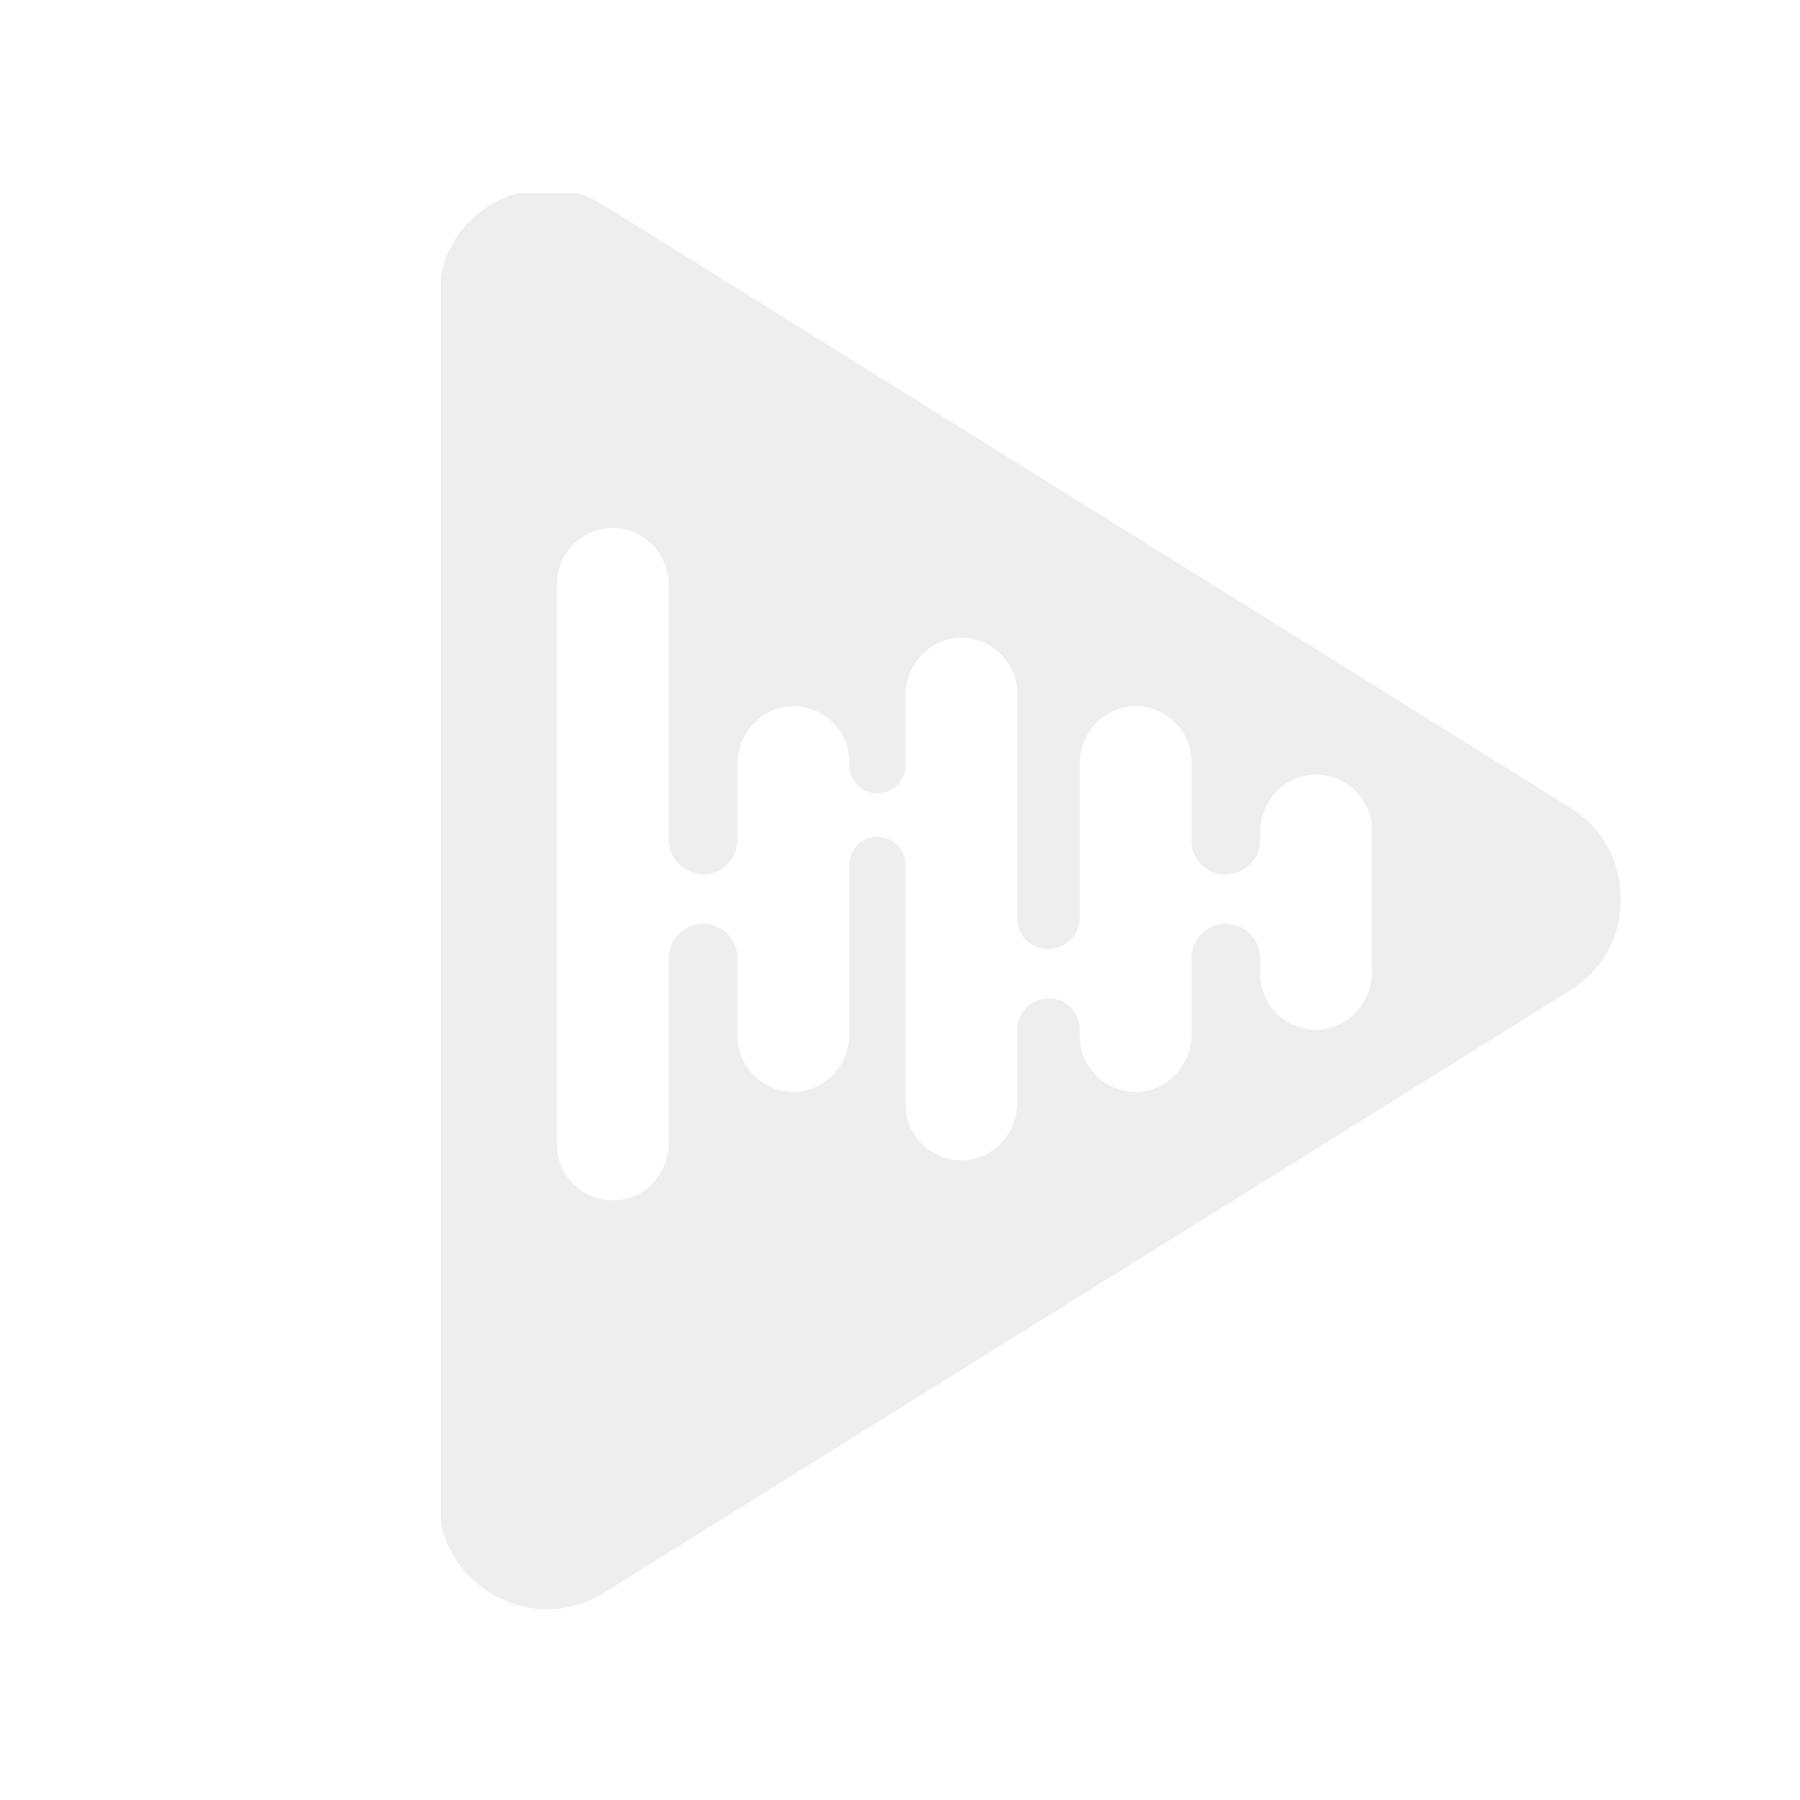 Kufatec Fistune 40148